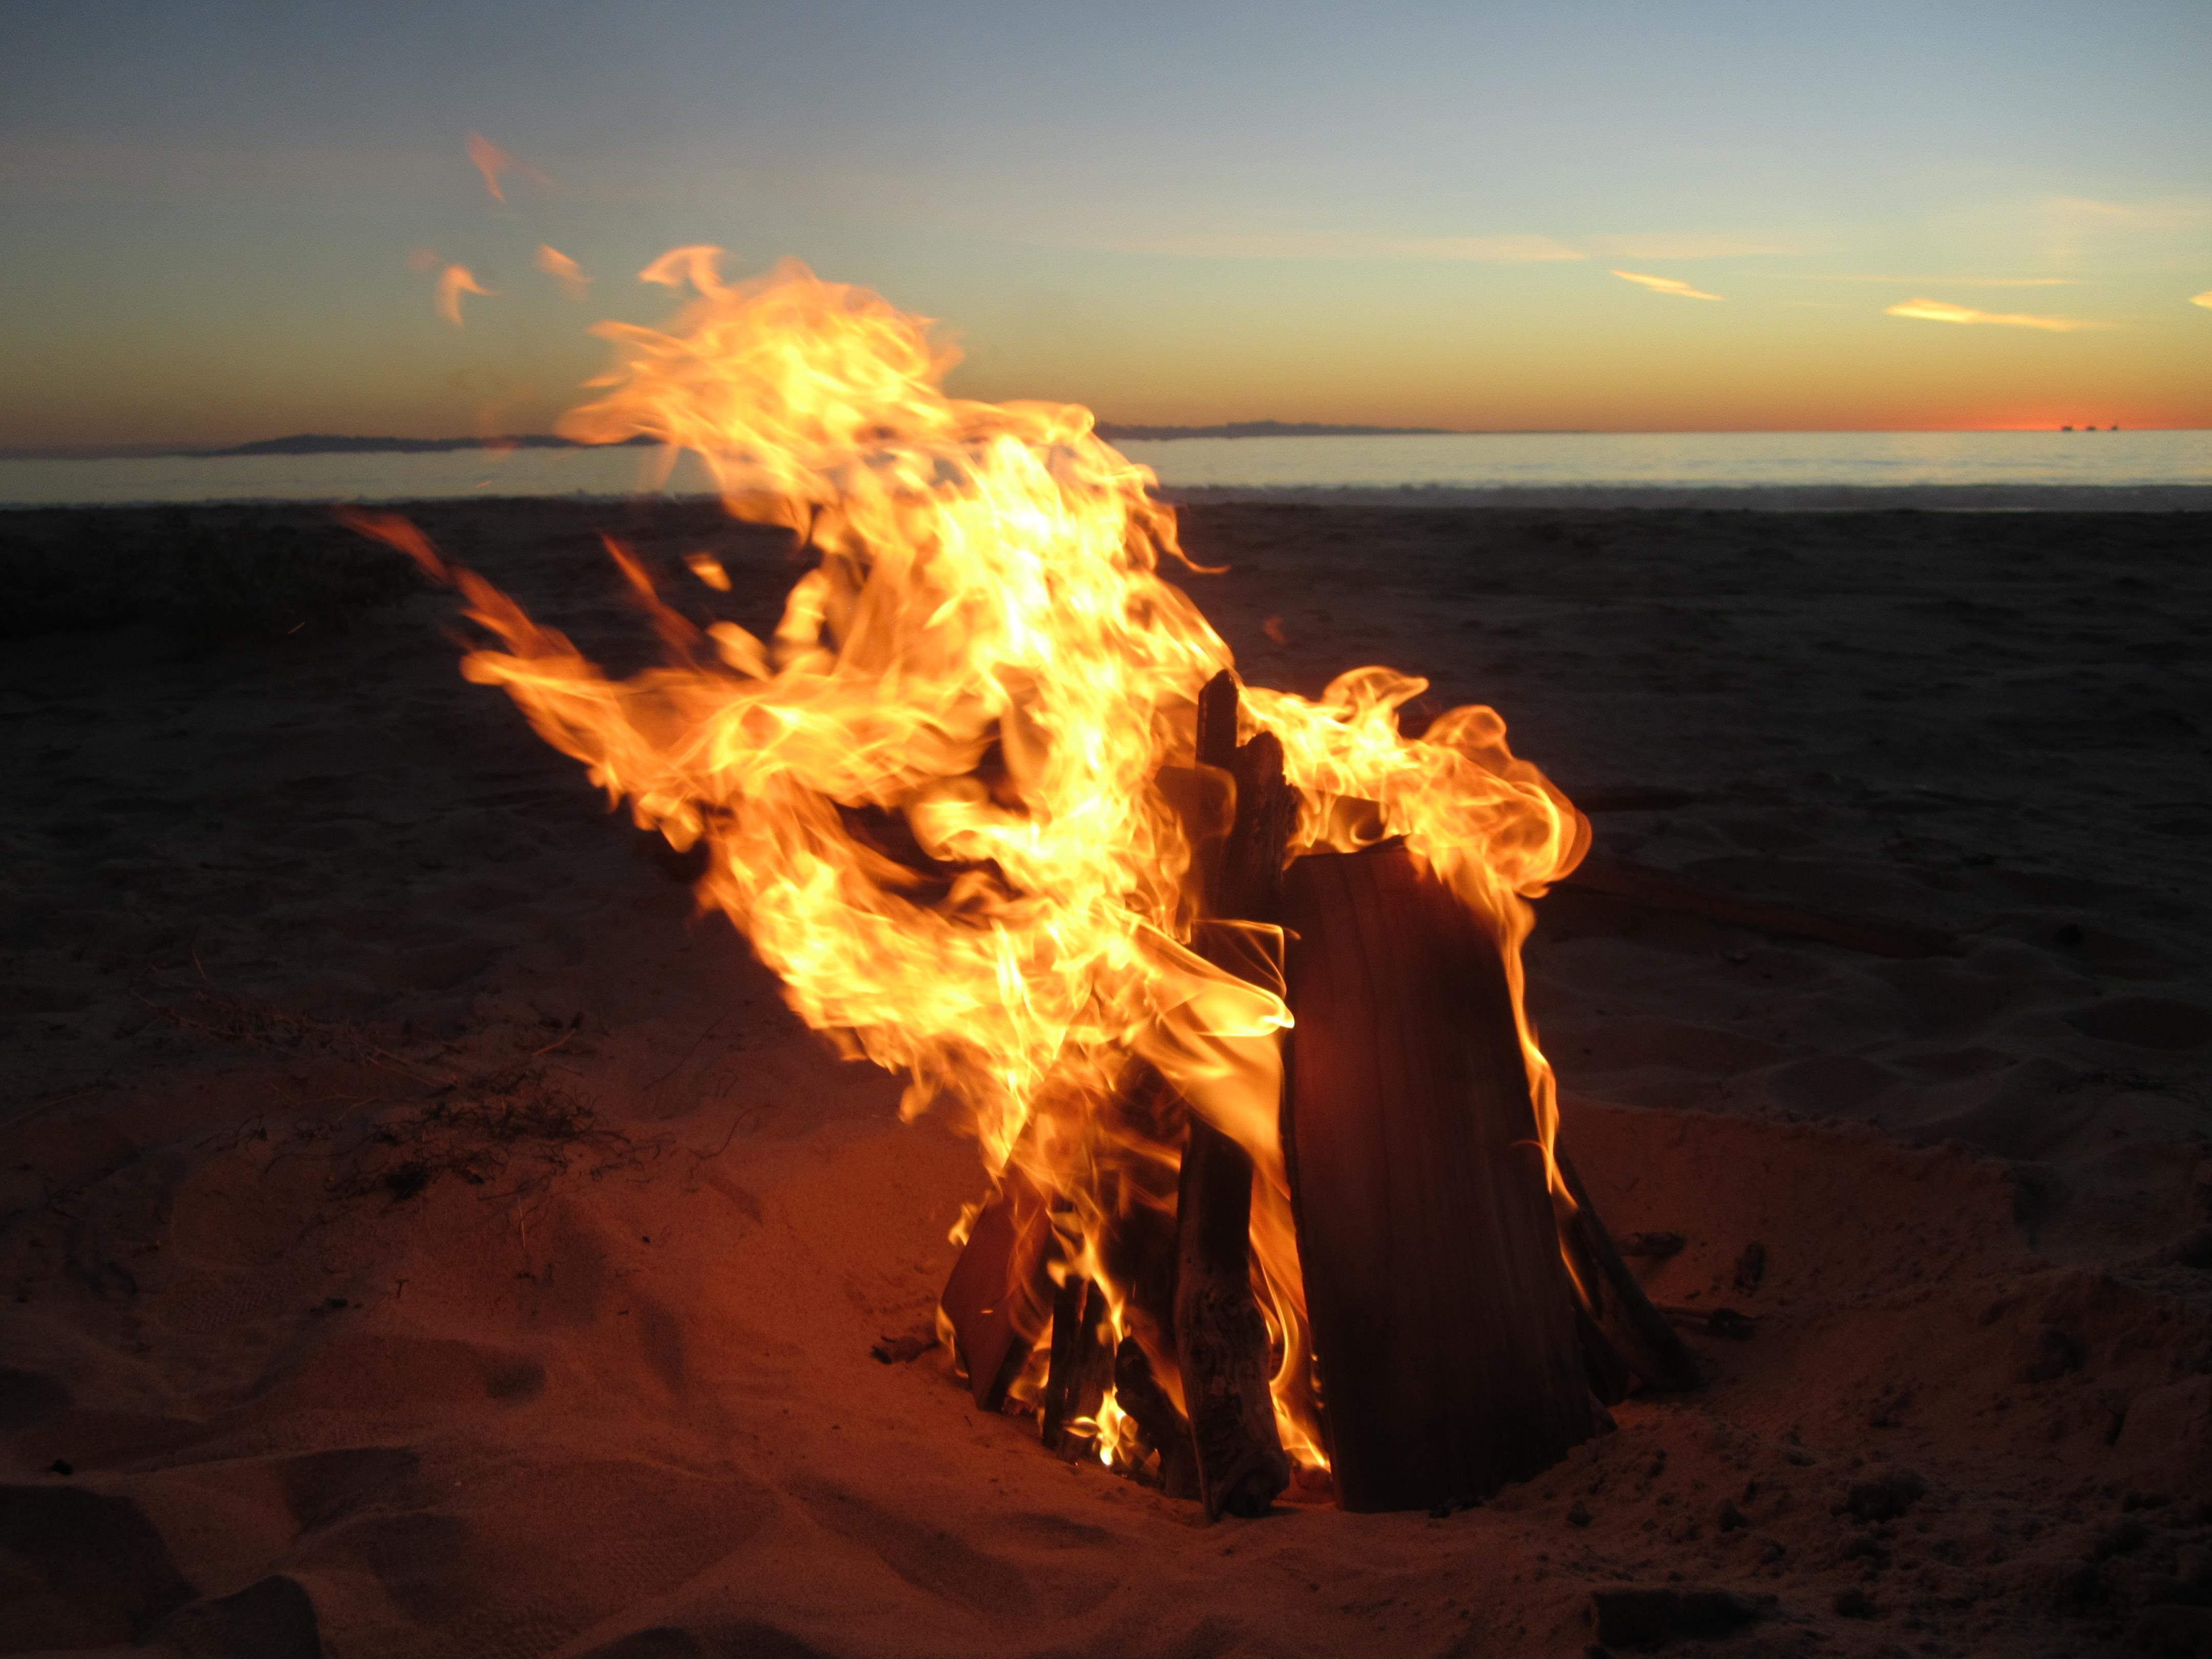 женственности, преданности, картинка костер на берегу моря коричневой мебели